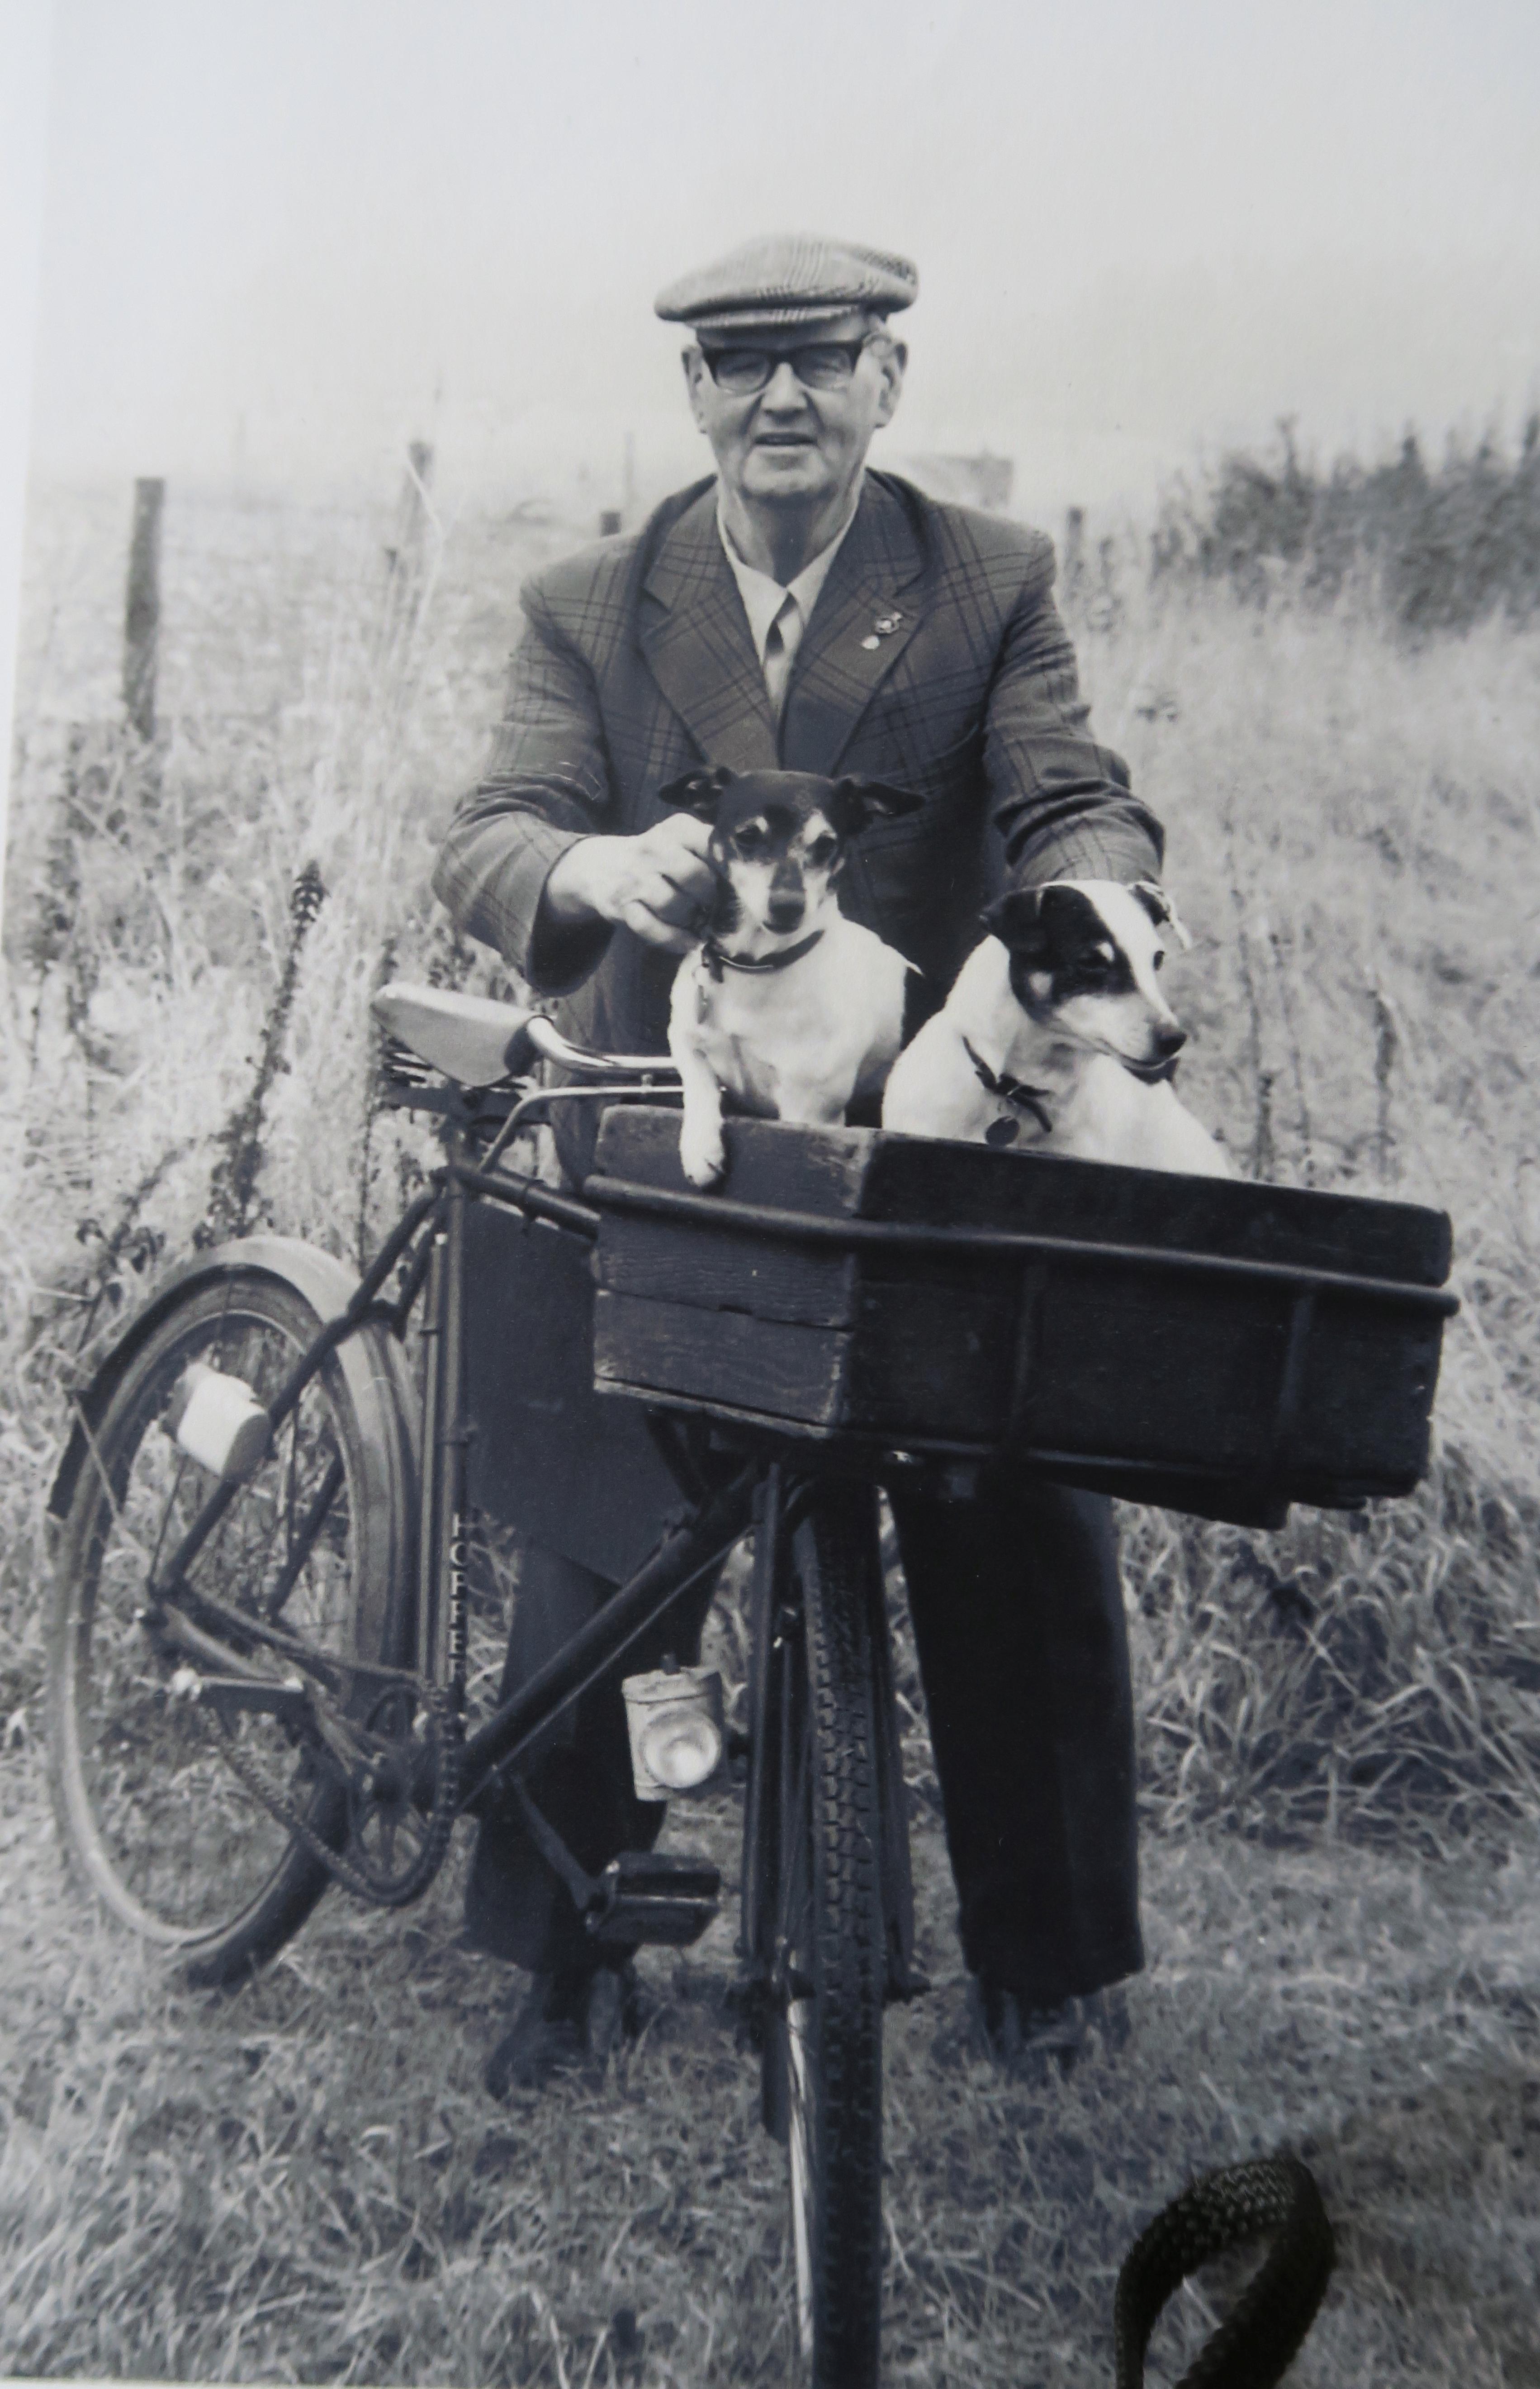 Drymere Warrener Arthur Mobbs